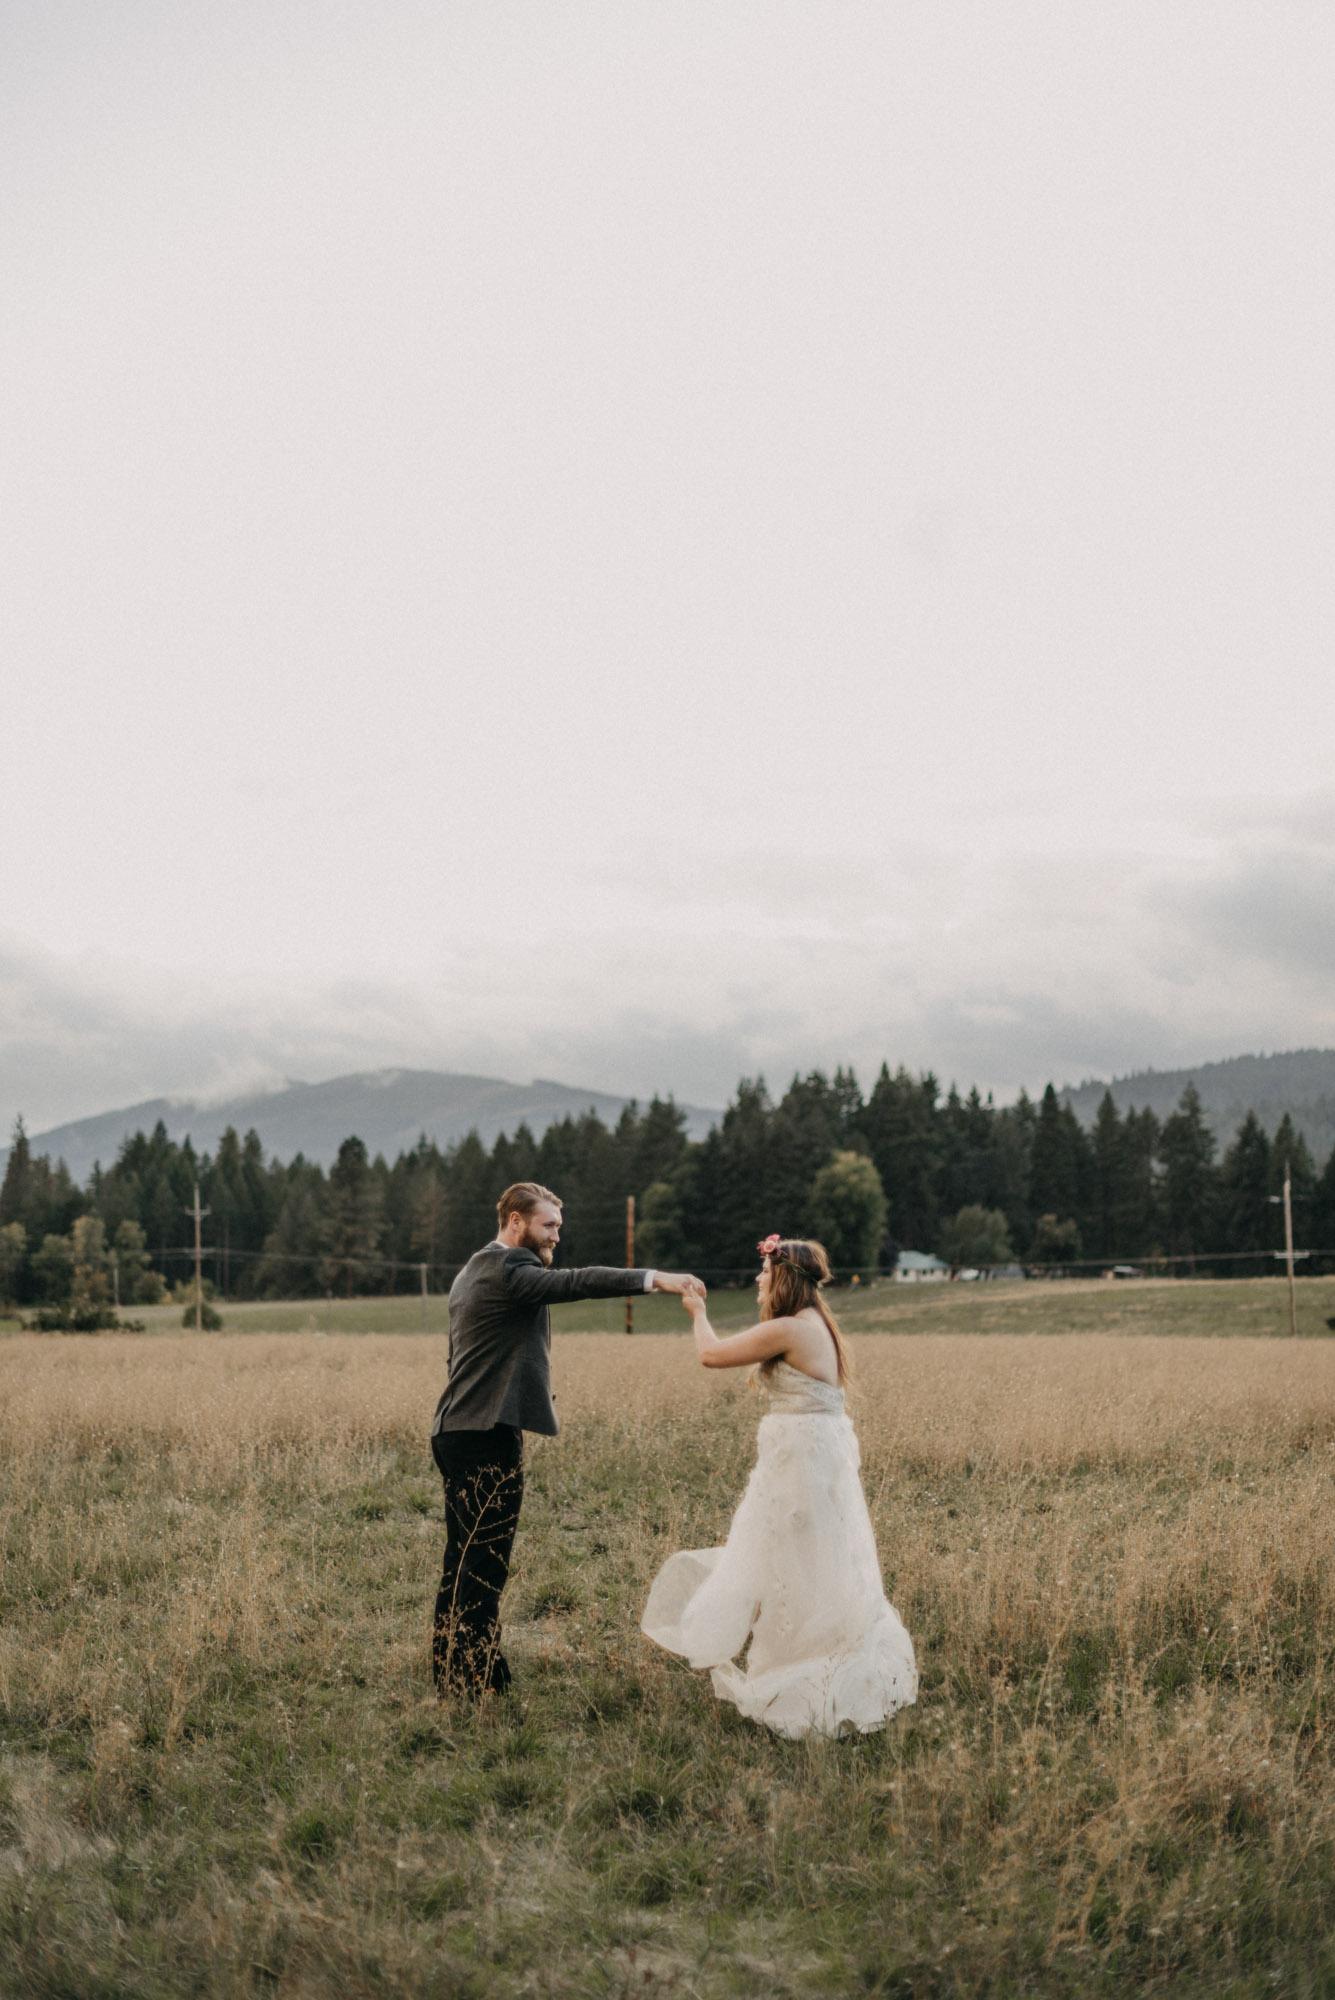 Portland-Washington-Wedding-Photographer-Outdoor-9604.jpg